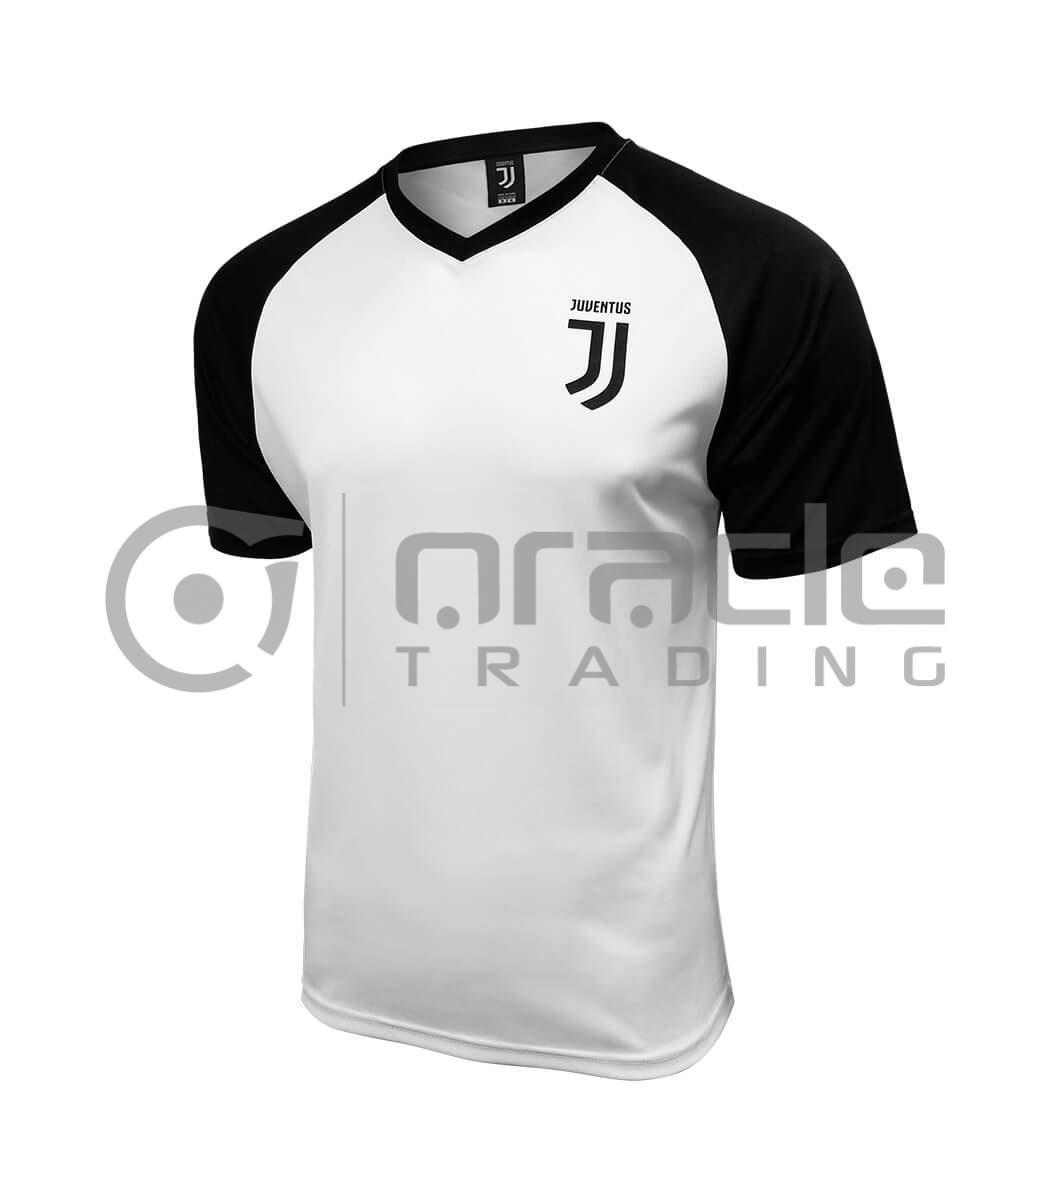 new arrival c2d32 a5dcc Juventus White Soccer Shirt